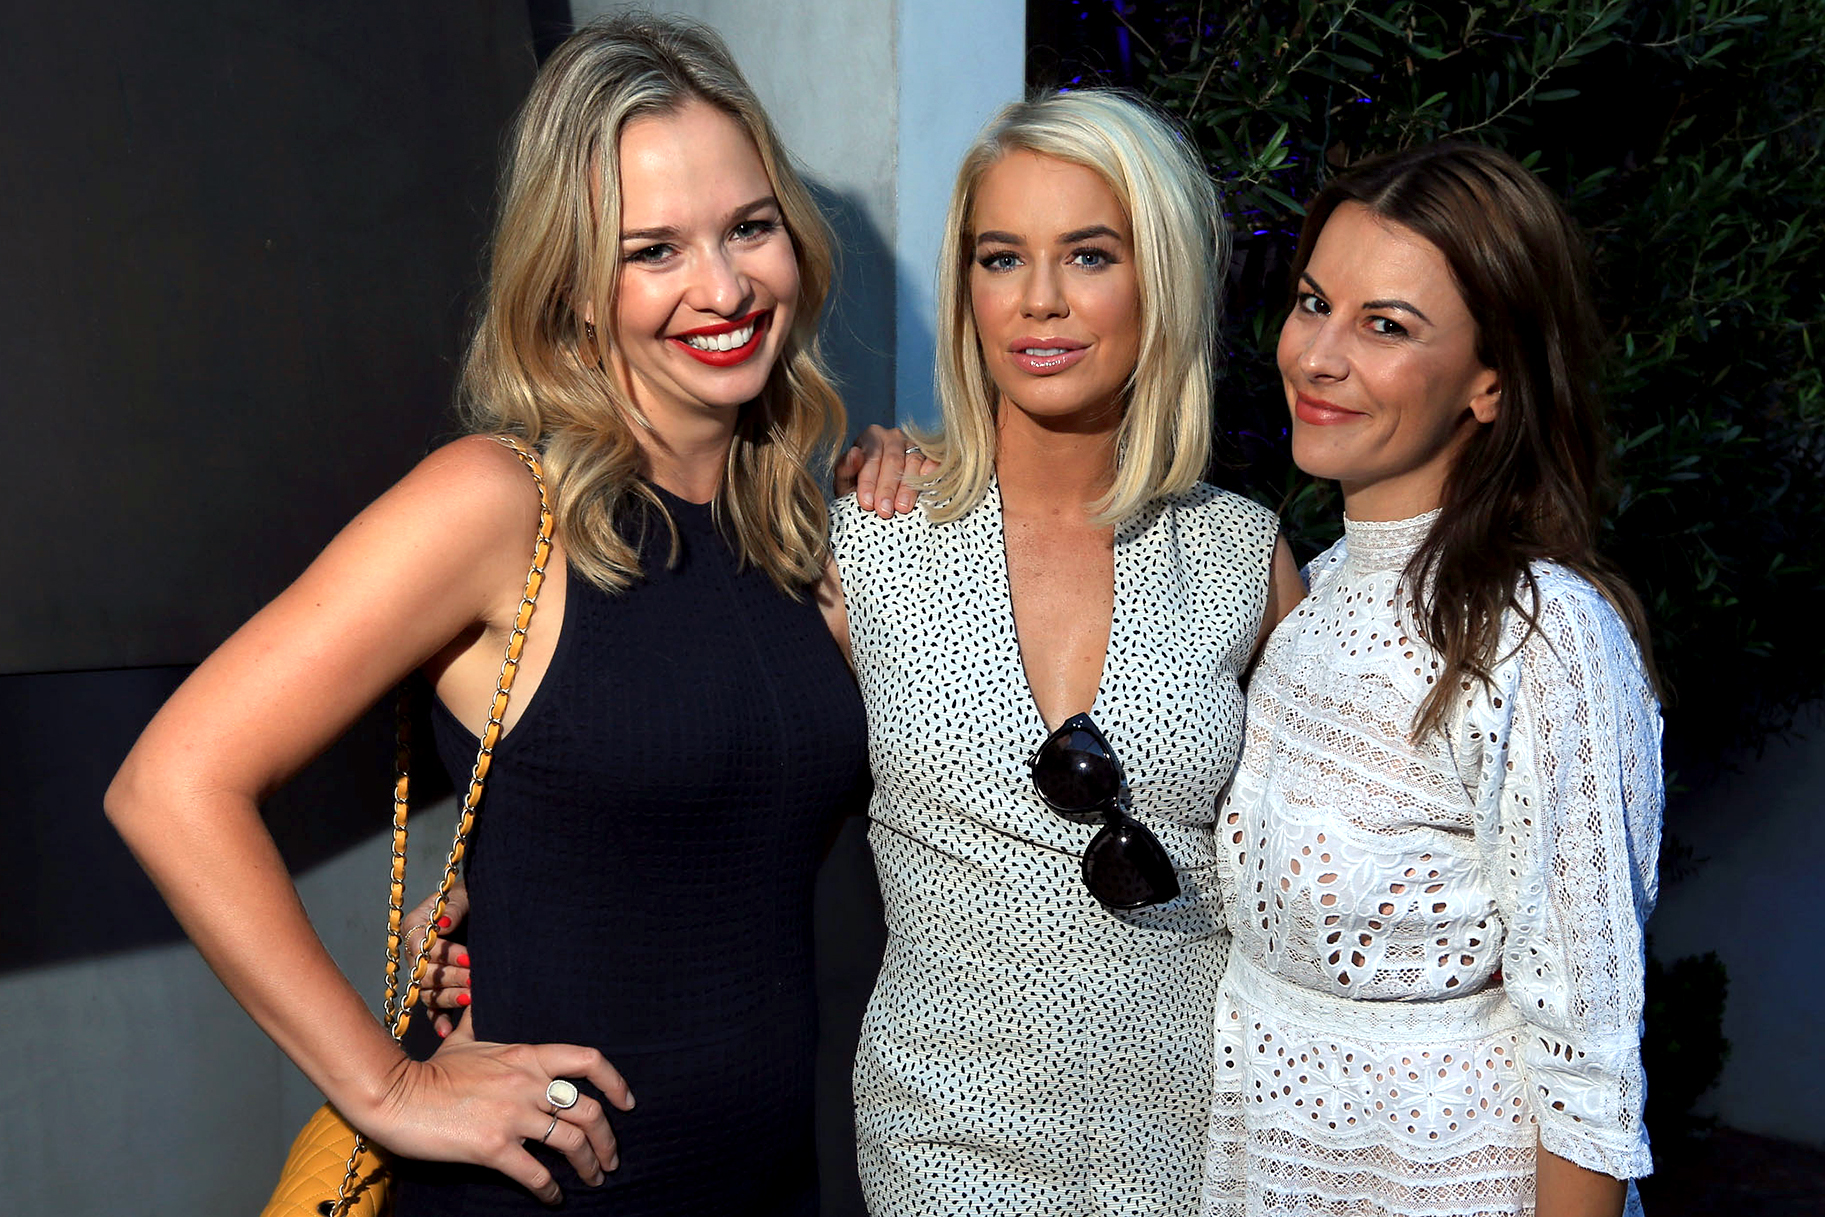 Caroline, Marissa, Juliet